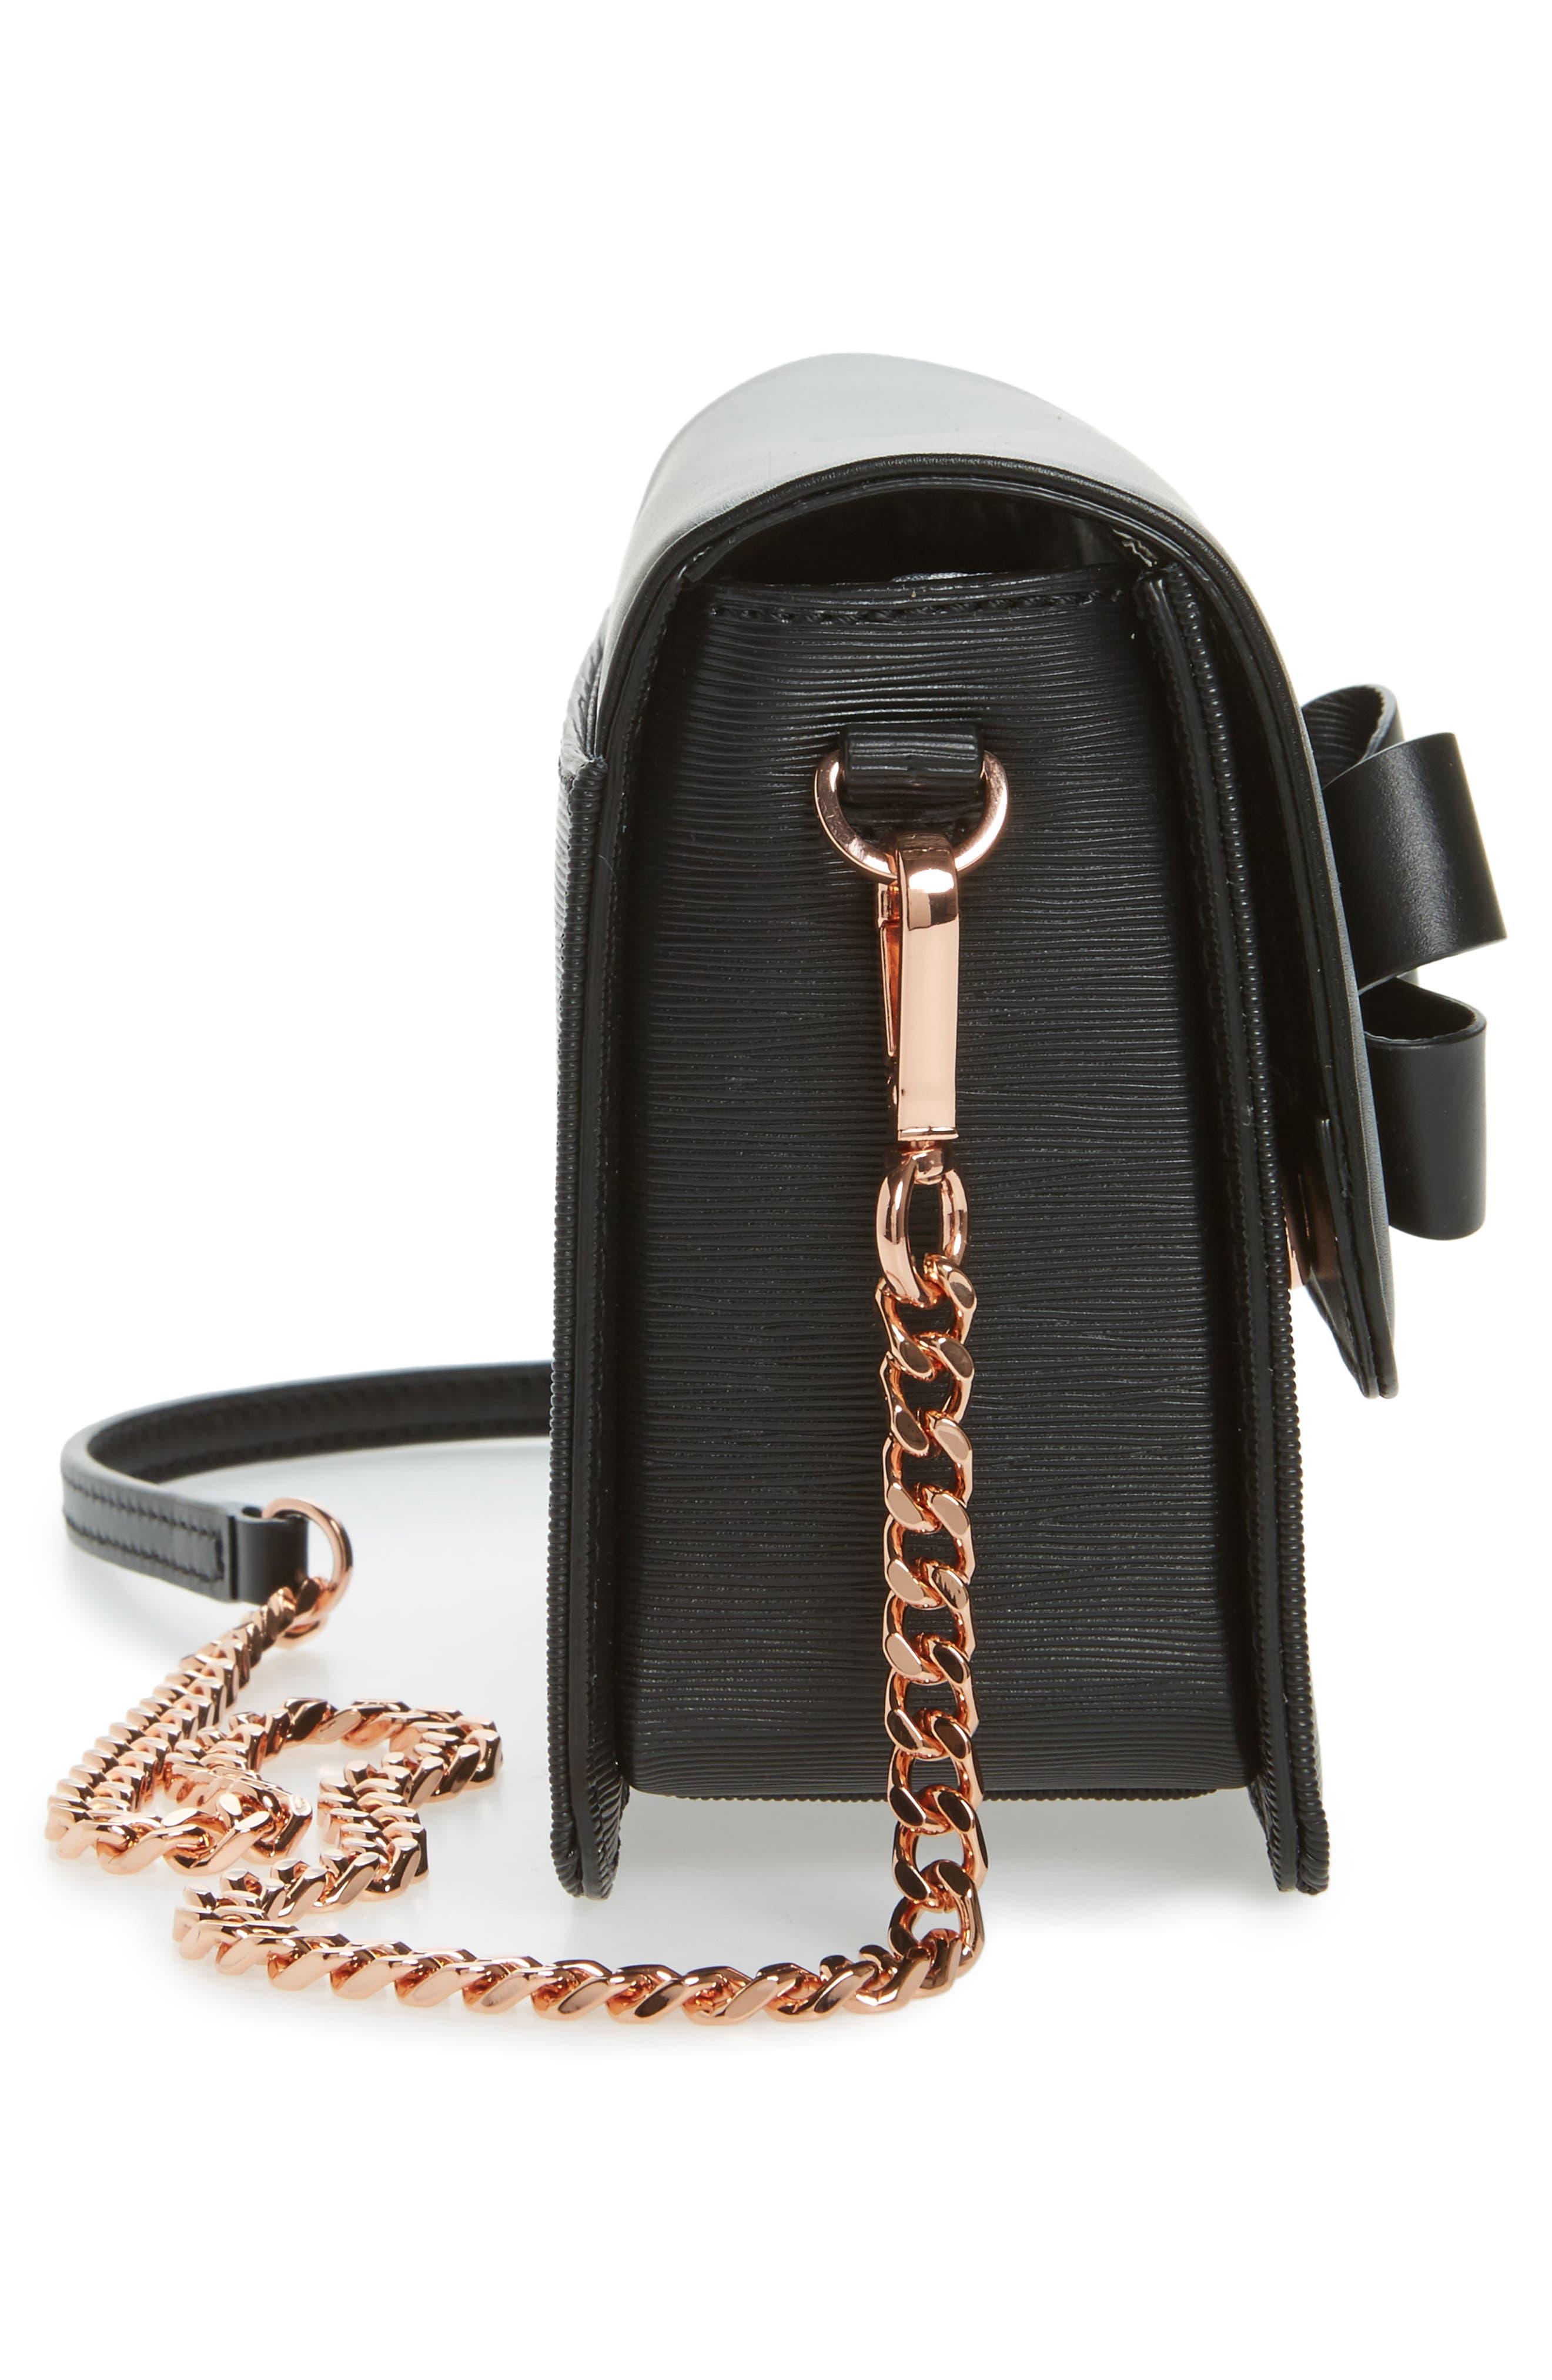 Callih Bow Leather Crossbody Bag,                             Alternate thumbnail 5, color,                             001